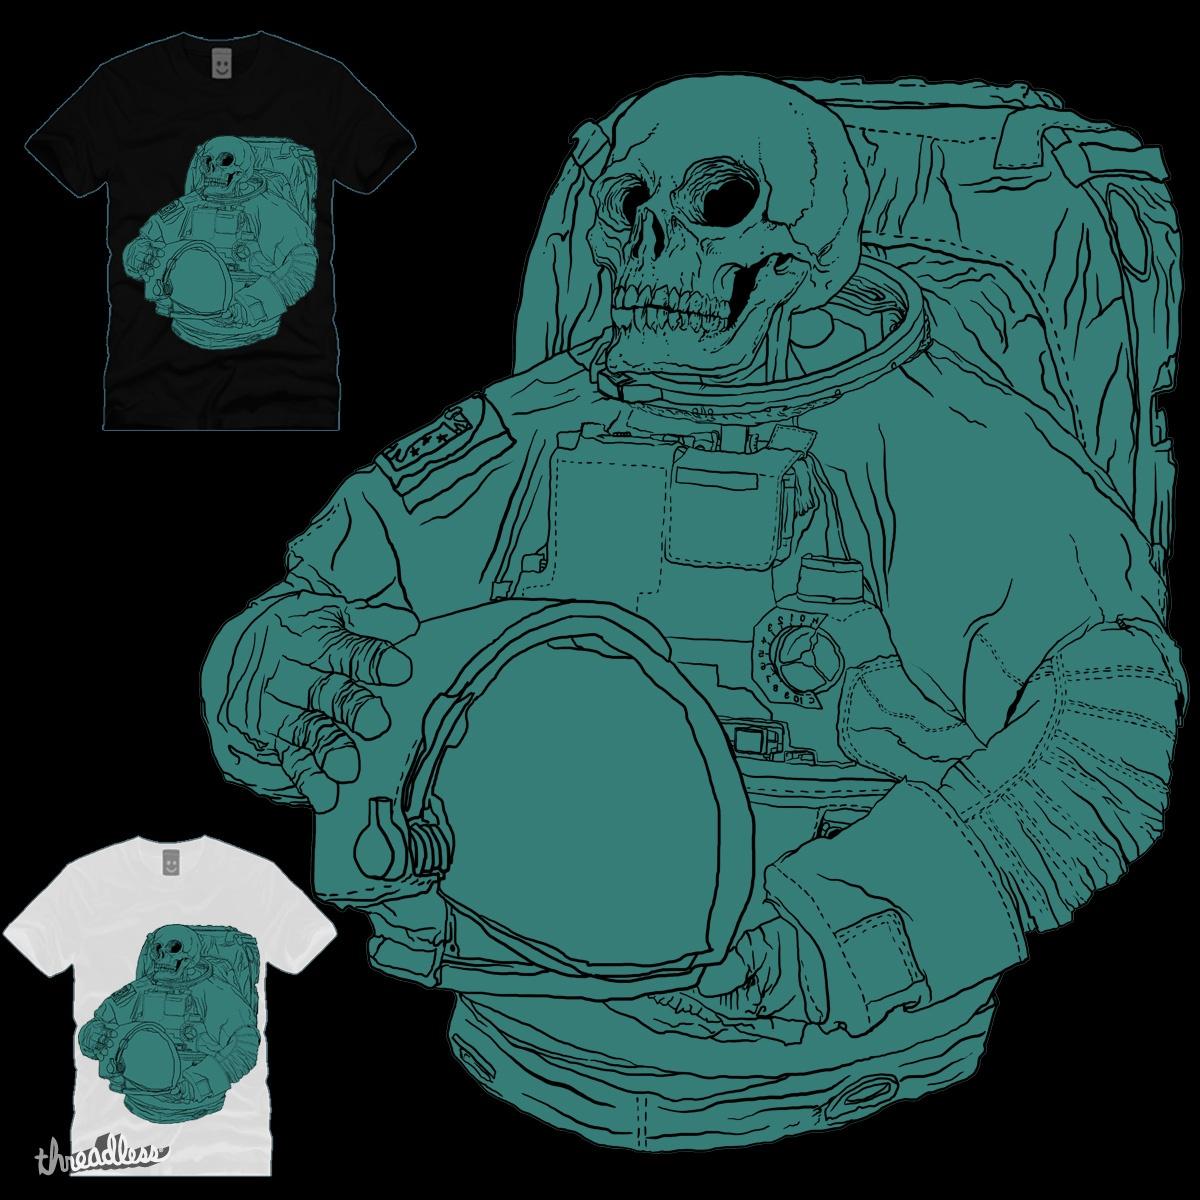 AstroSkull by gupikus on Threadless